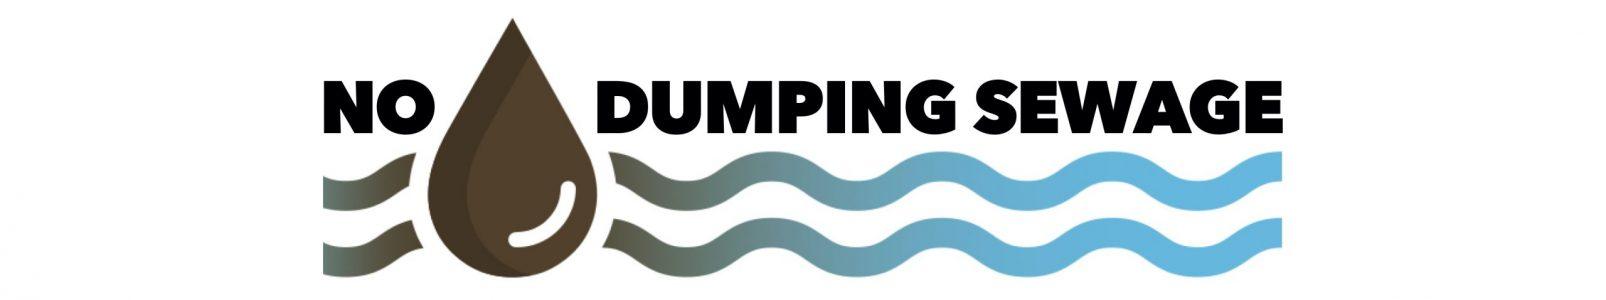 No Dumping Sewage